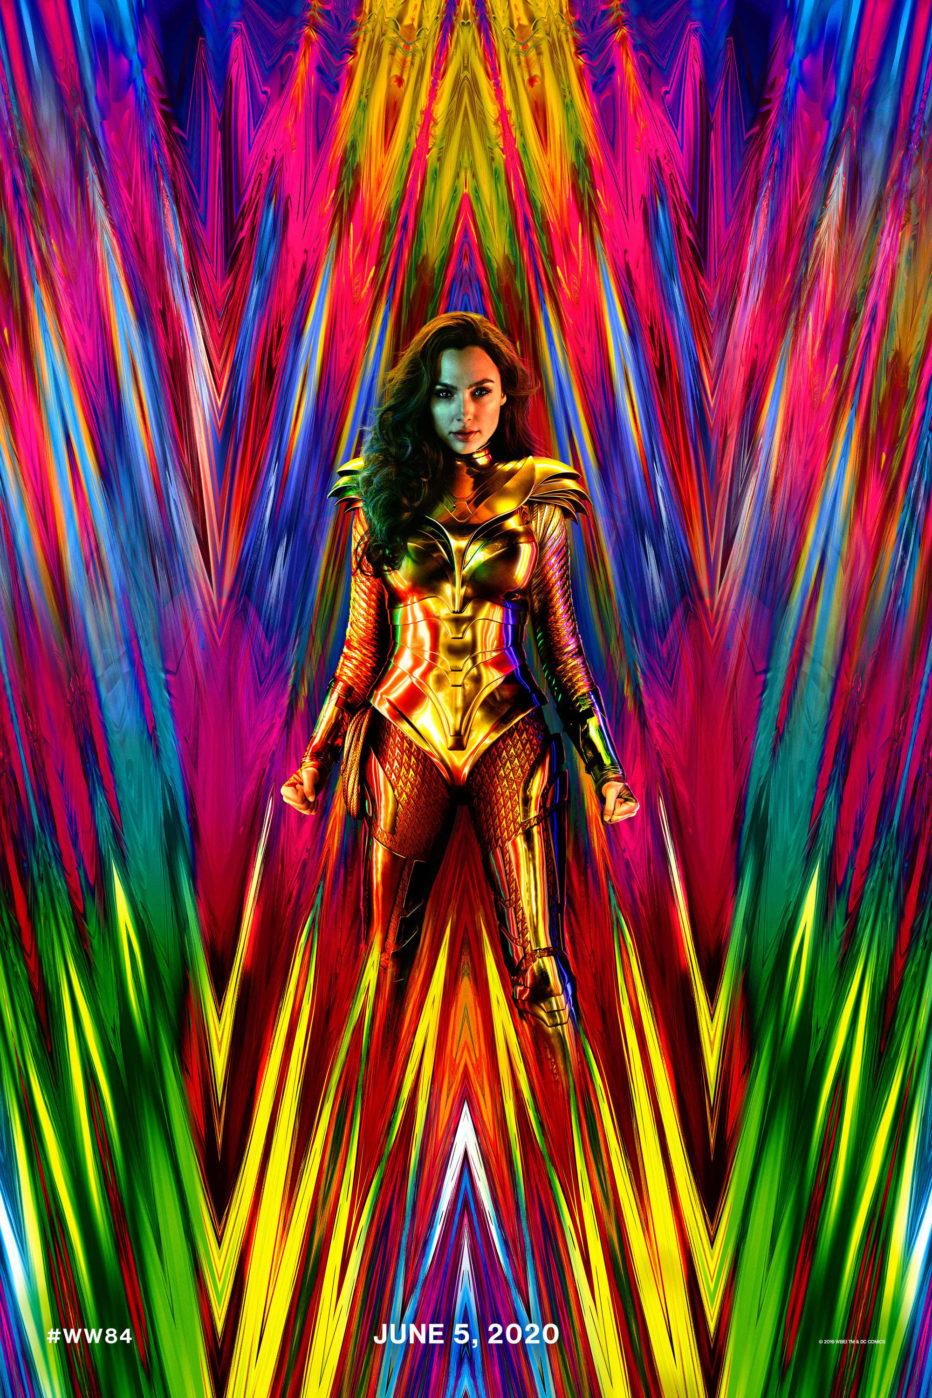 Trailer de Wonder Woman 1984